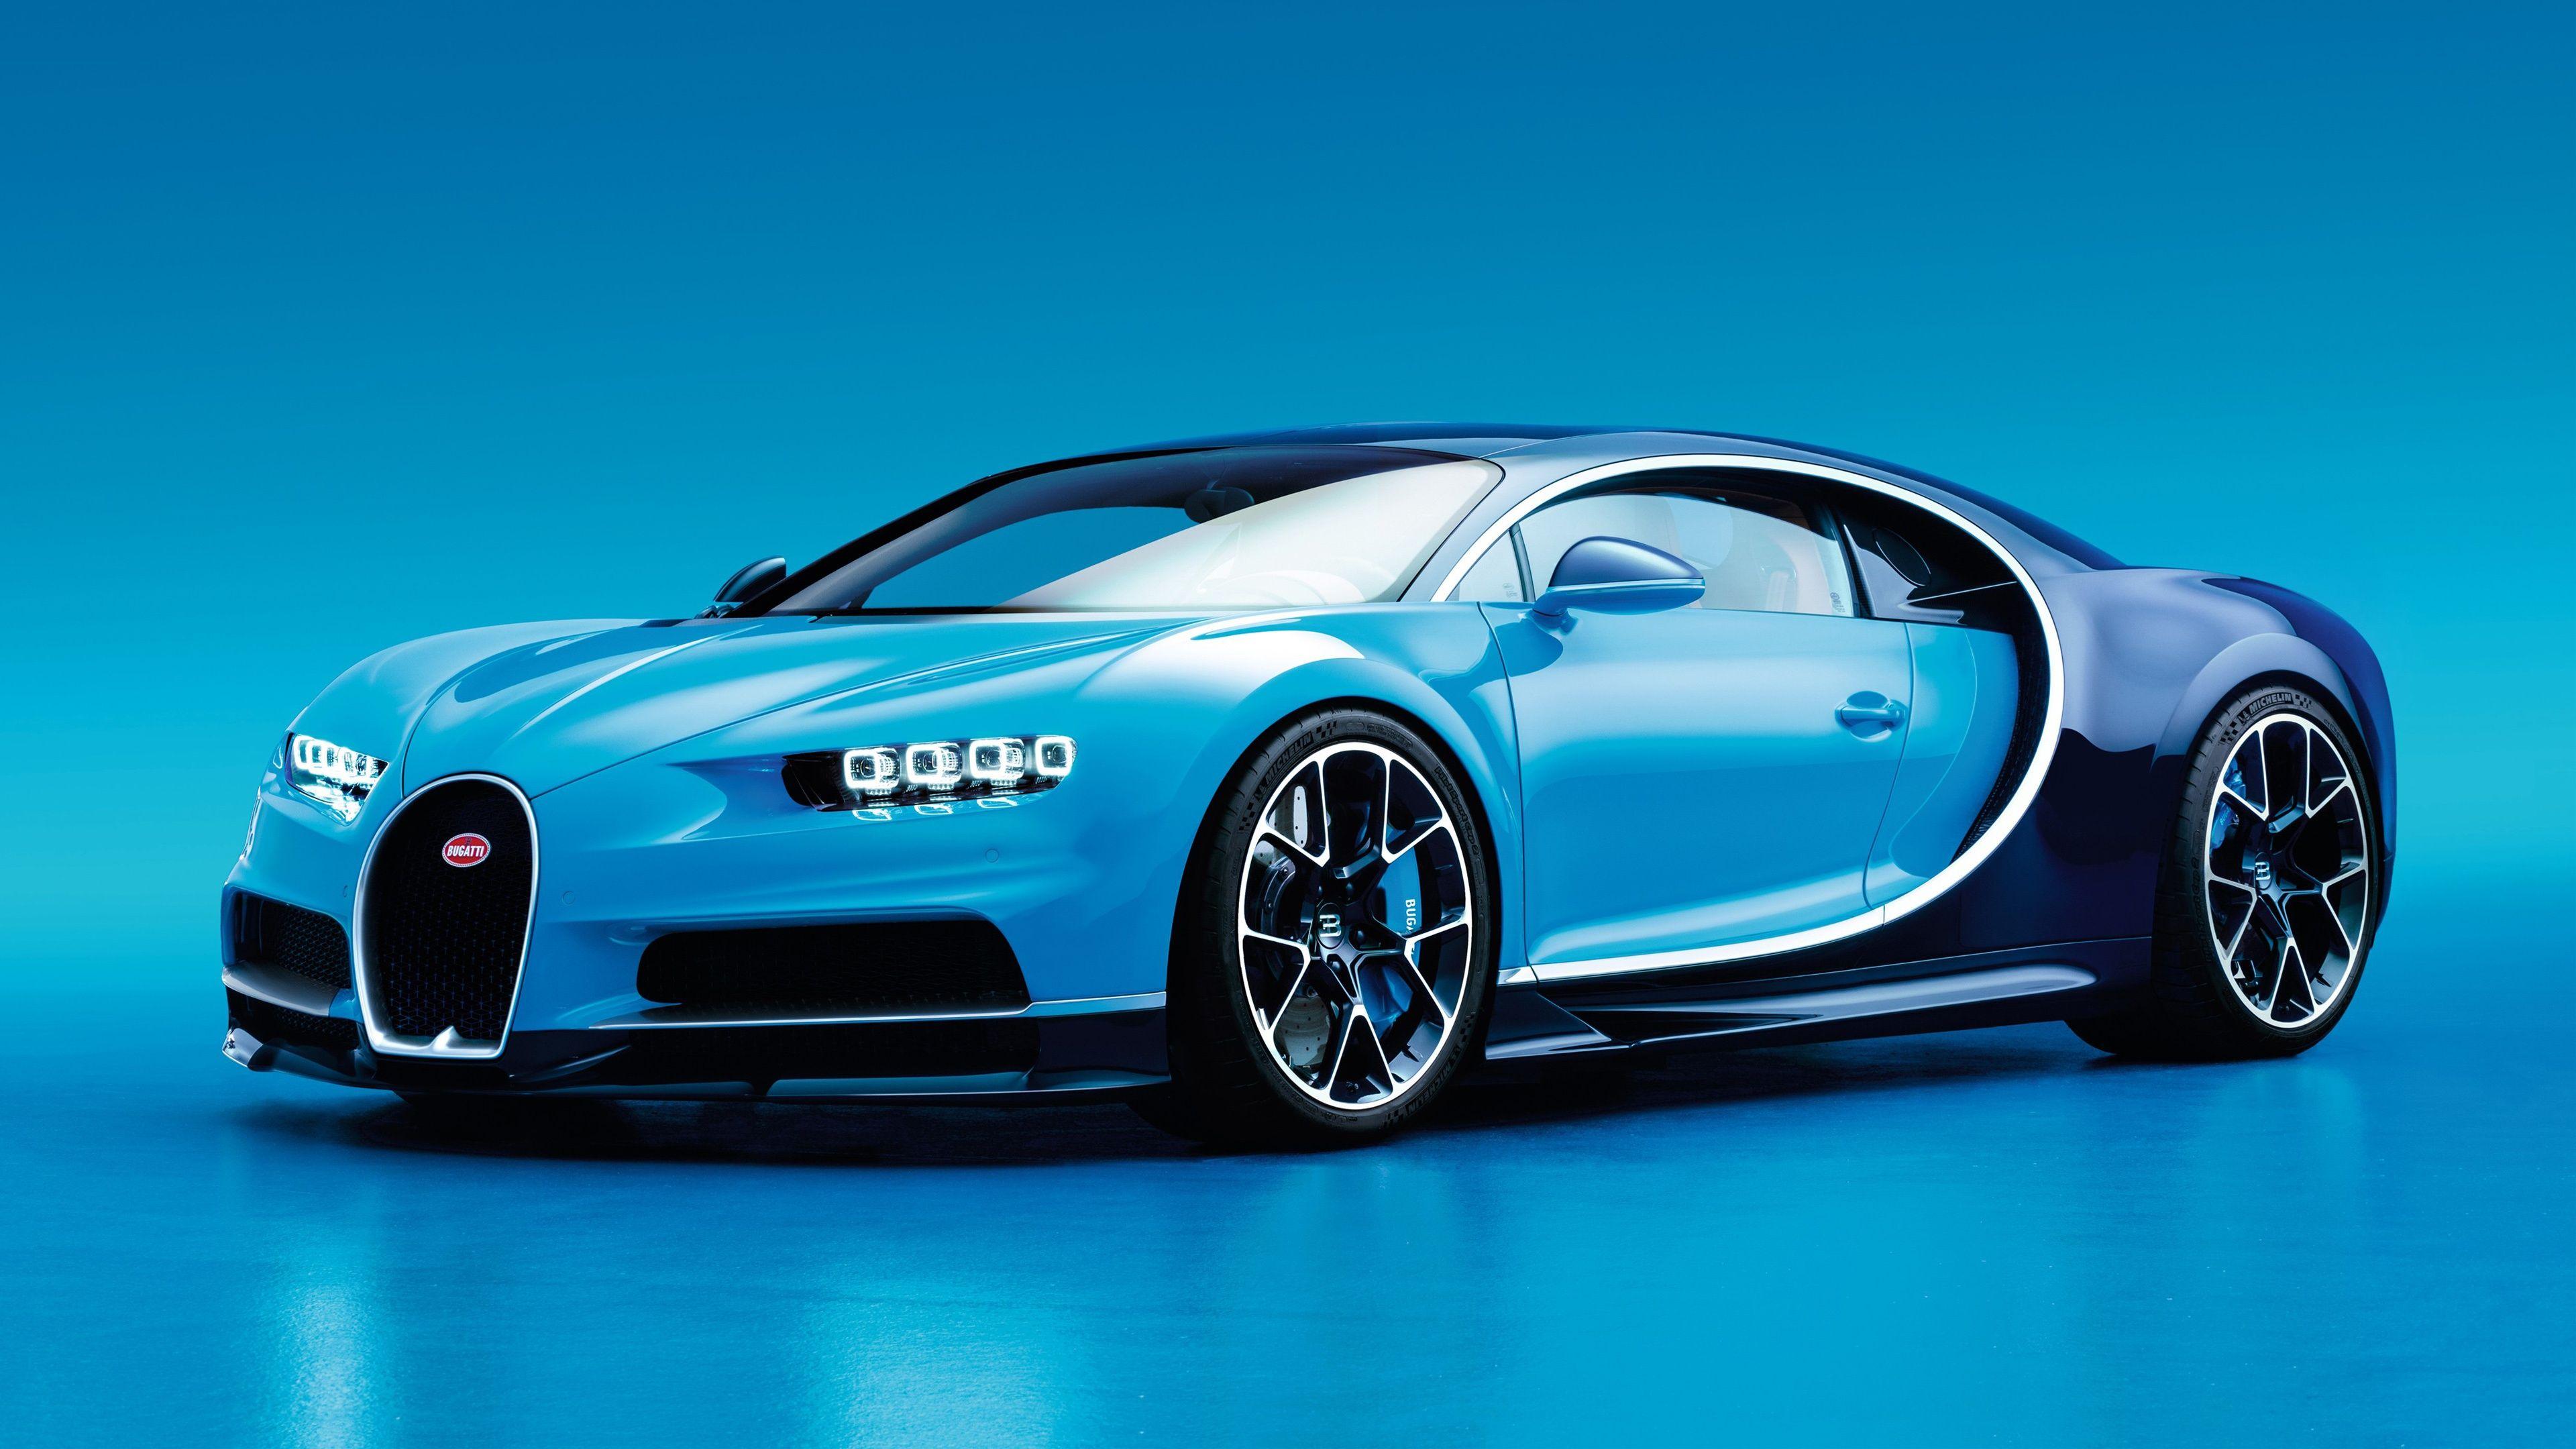 Bugatti Veyron Wallpaper Widescreen 7gy Bugatti Cars Bugatti Chiron New Bugatti Chiron